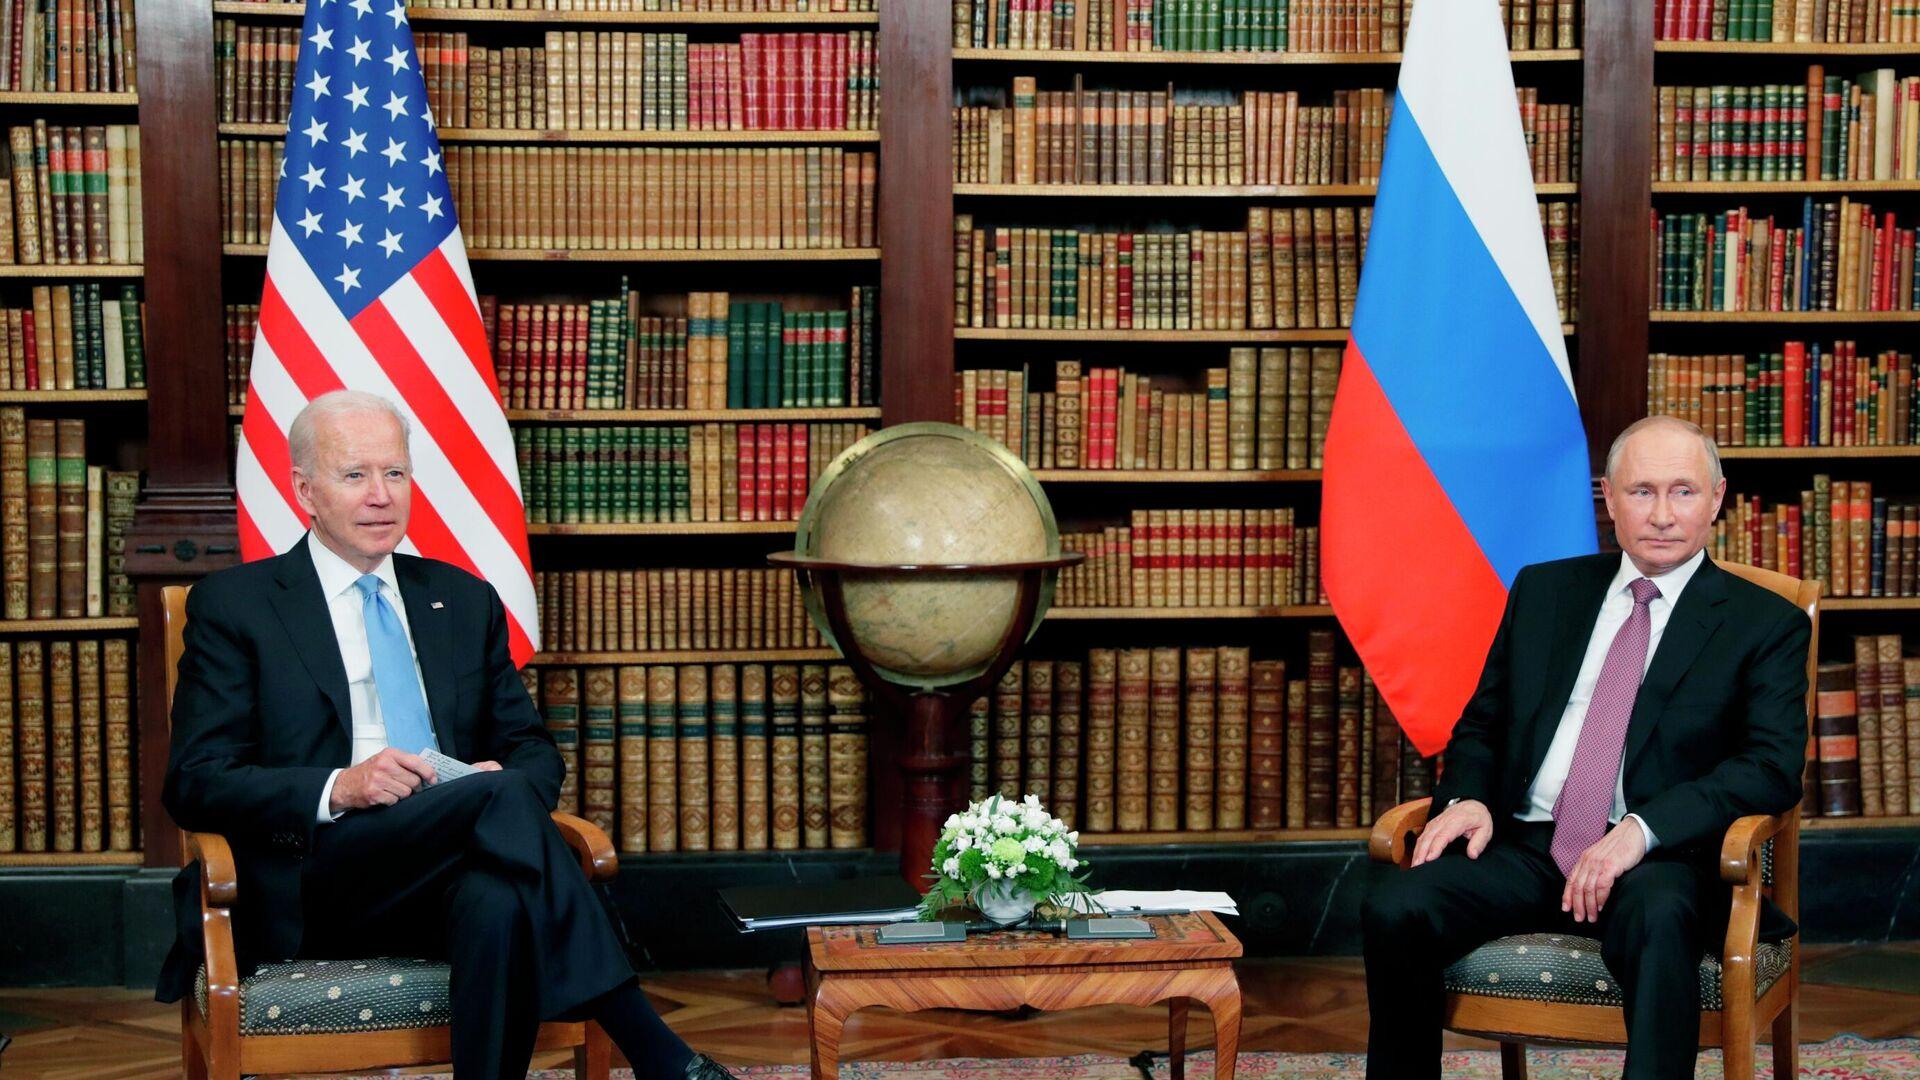 L'incontro bilaterale tra Putin e Biden a Ginevra - Sputnik Italia, 1920, 14.10.2021